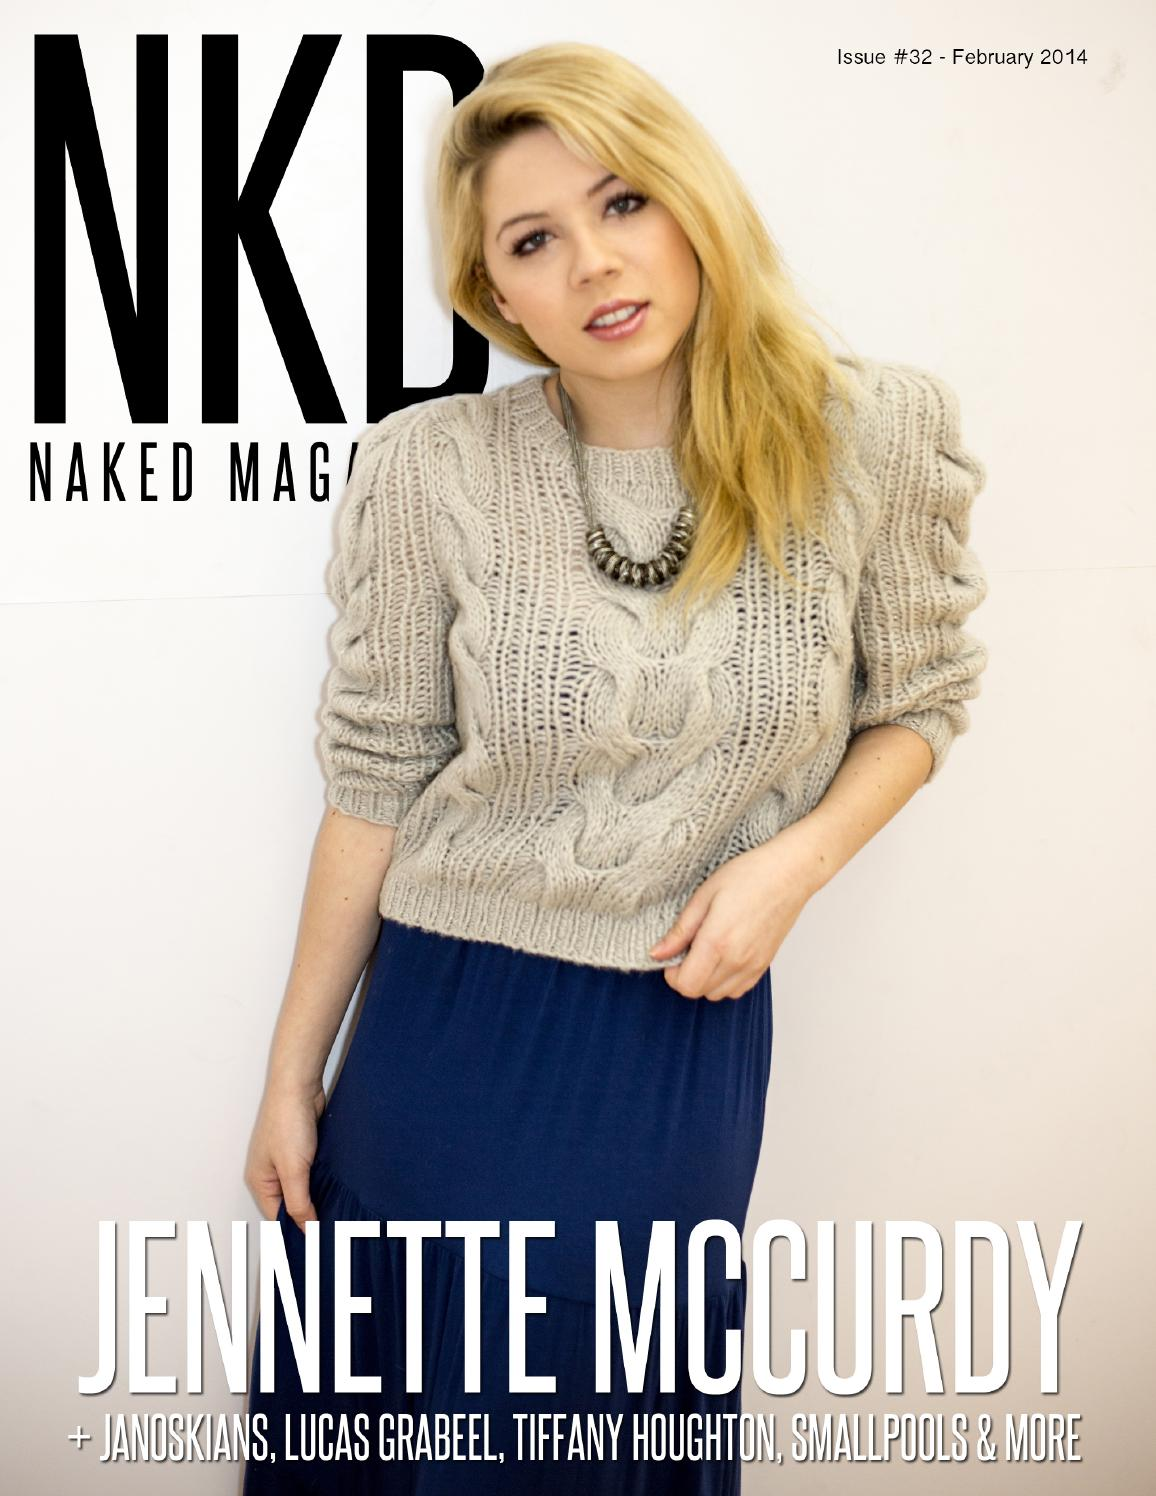 NKD Mag - Issue #32 (February 2014) by NKD Mag - issuu